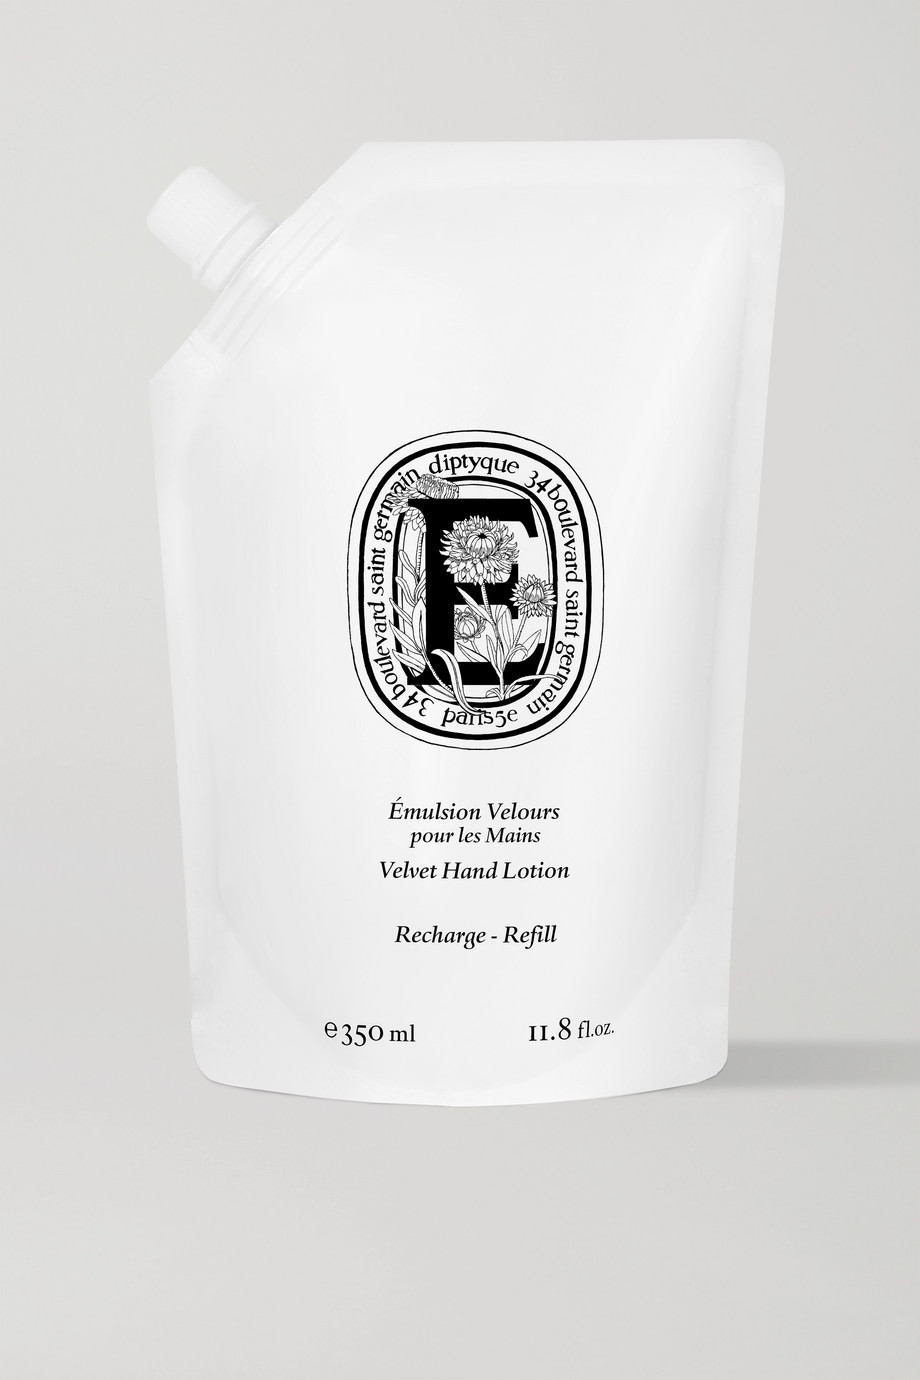 Diptyque Velvet Hand Lotion, 350 ml – Handlotion (Nachfüll-Packung)